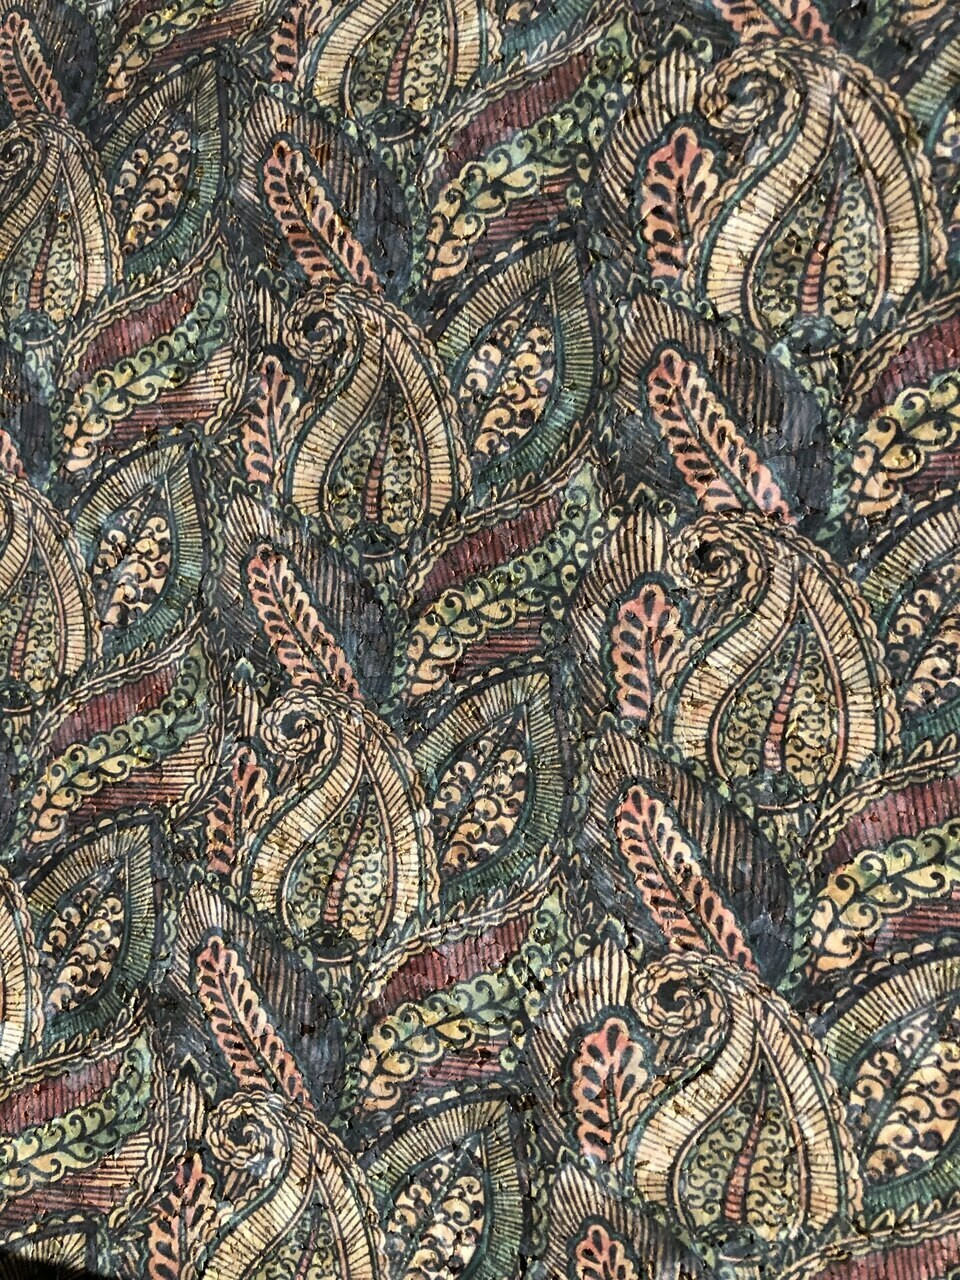 Natural Cork with Paisley Print